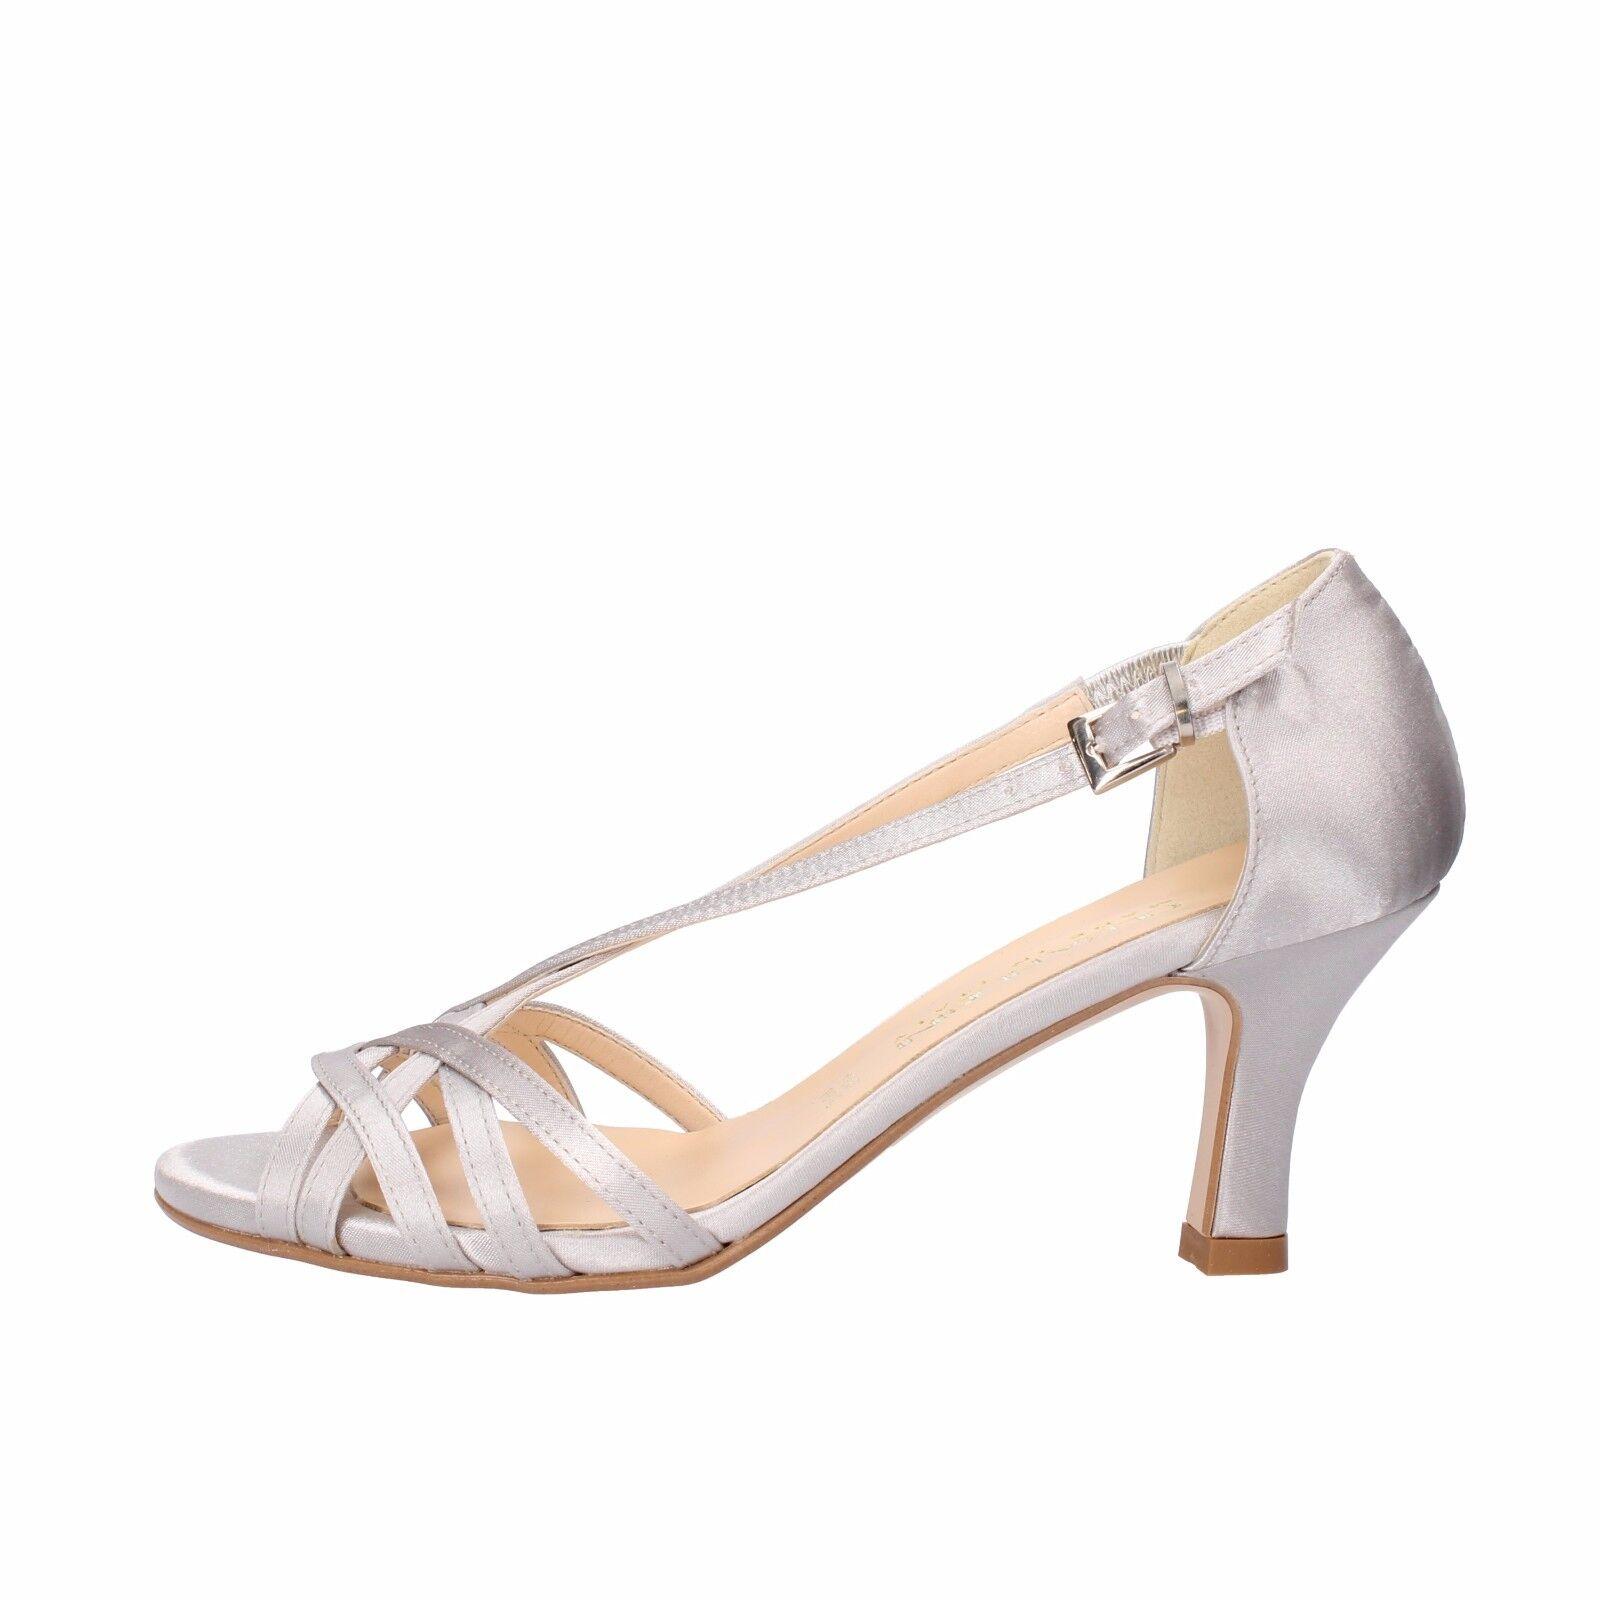 Scarpe EU donna OLGA RUBINI 38 EU Scarpe sandali argento raso AF133-D3 91d5f2